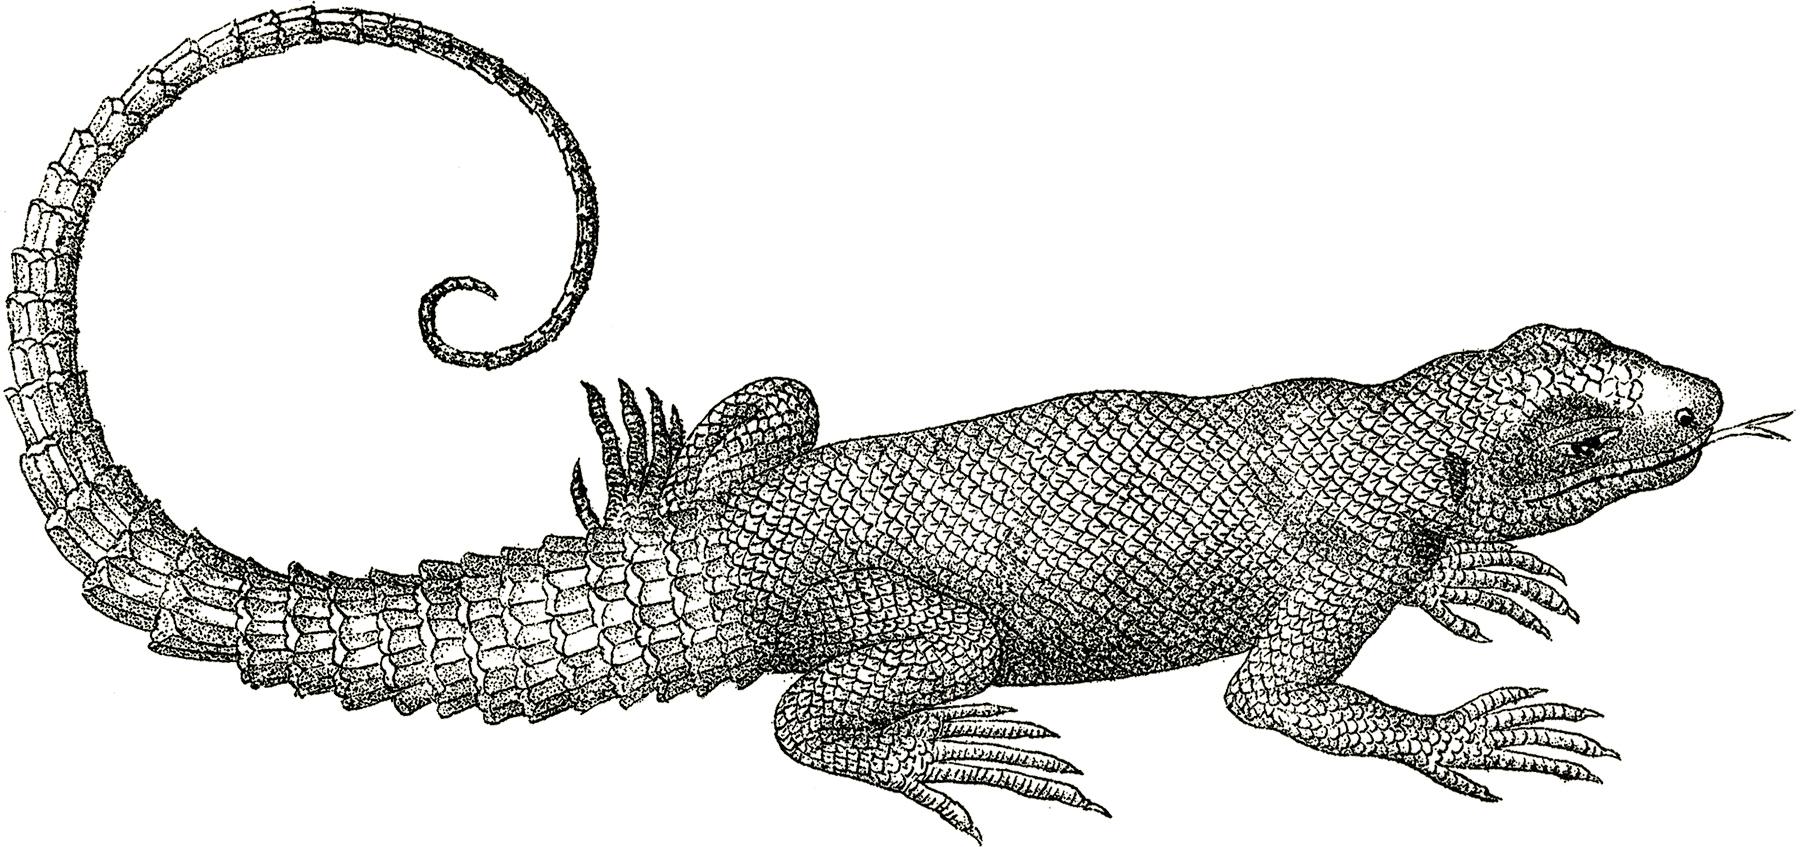 Free-Vintage-Lizard-Clip-Art-GraphicsFairy.jpg